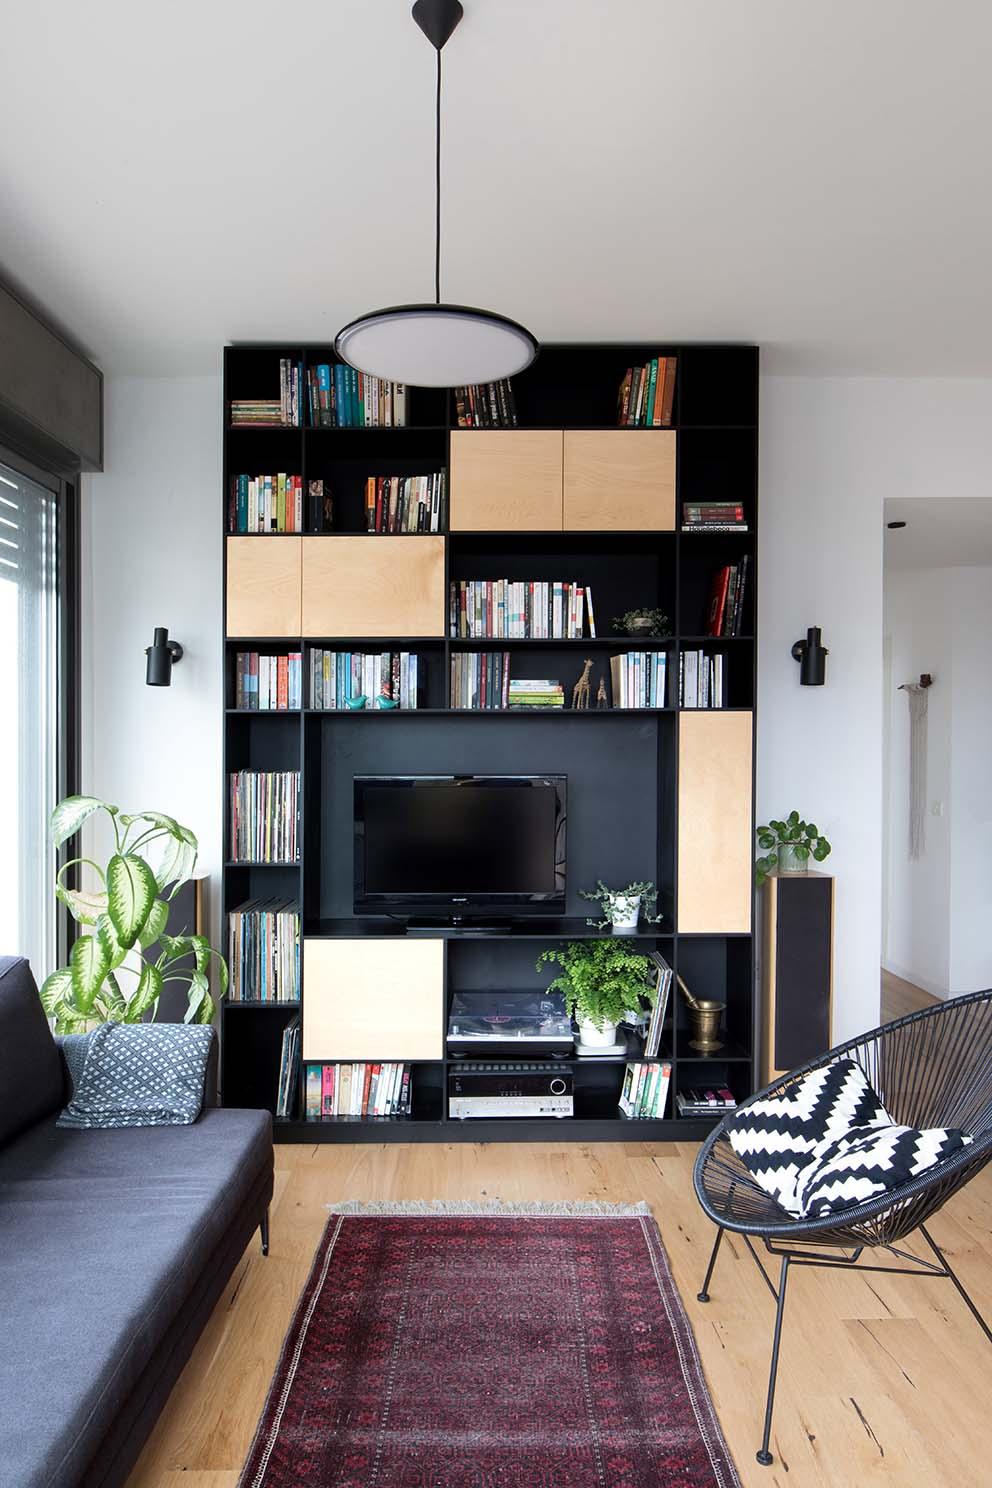 עיצוב: אייר שפירא, צילום: שירן כרמל, www.pnim.co.il